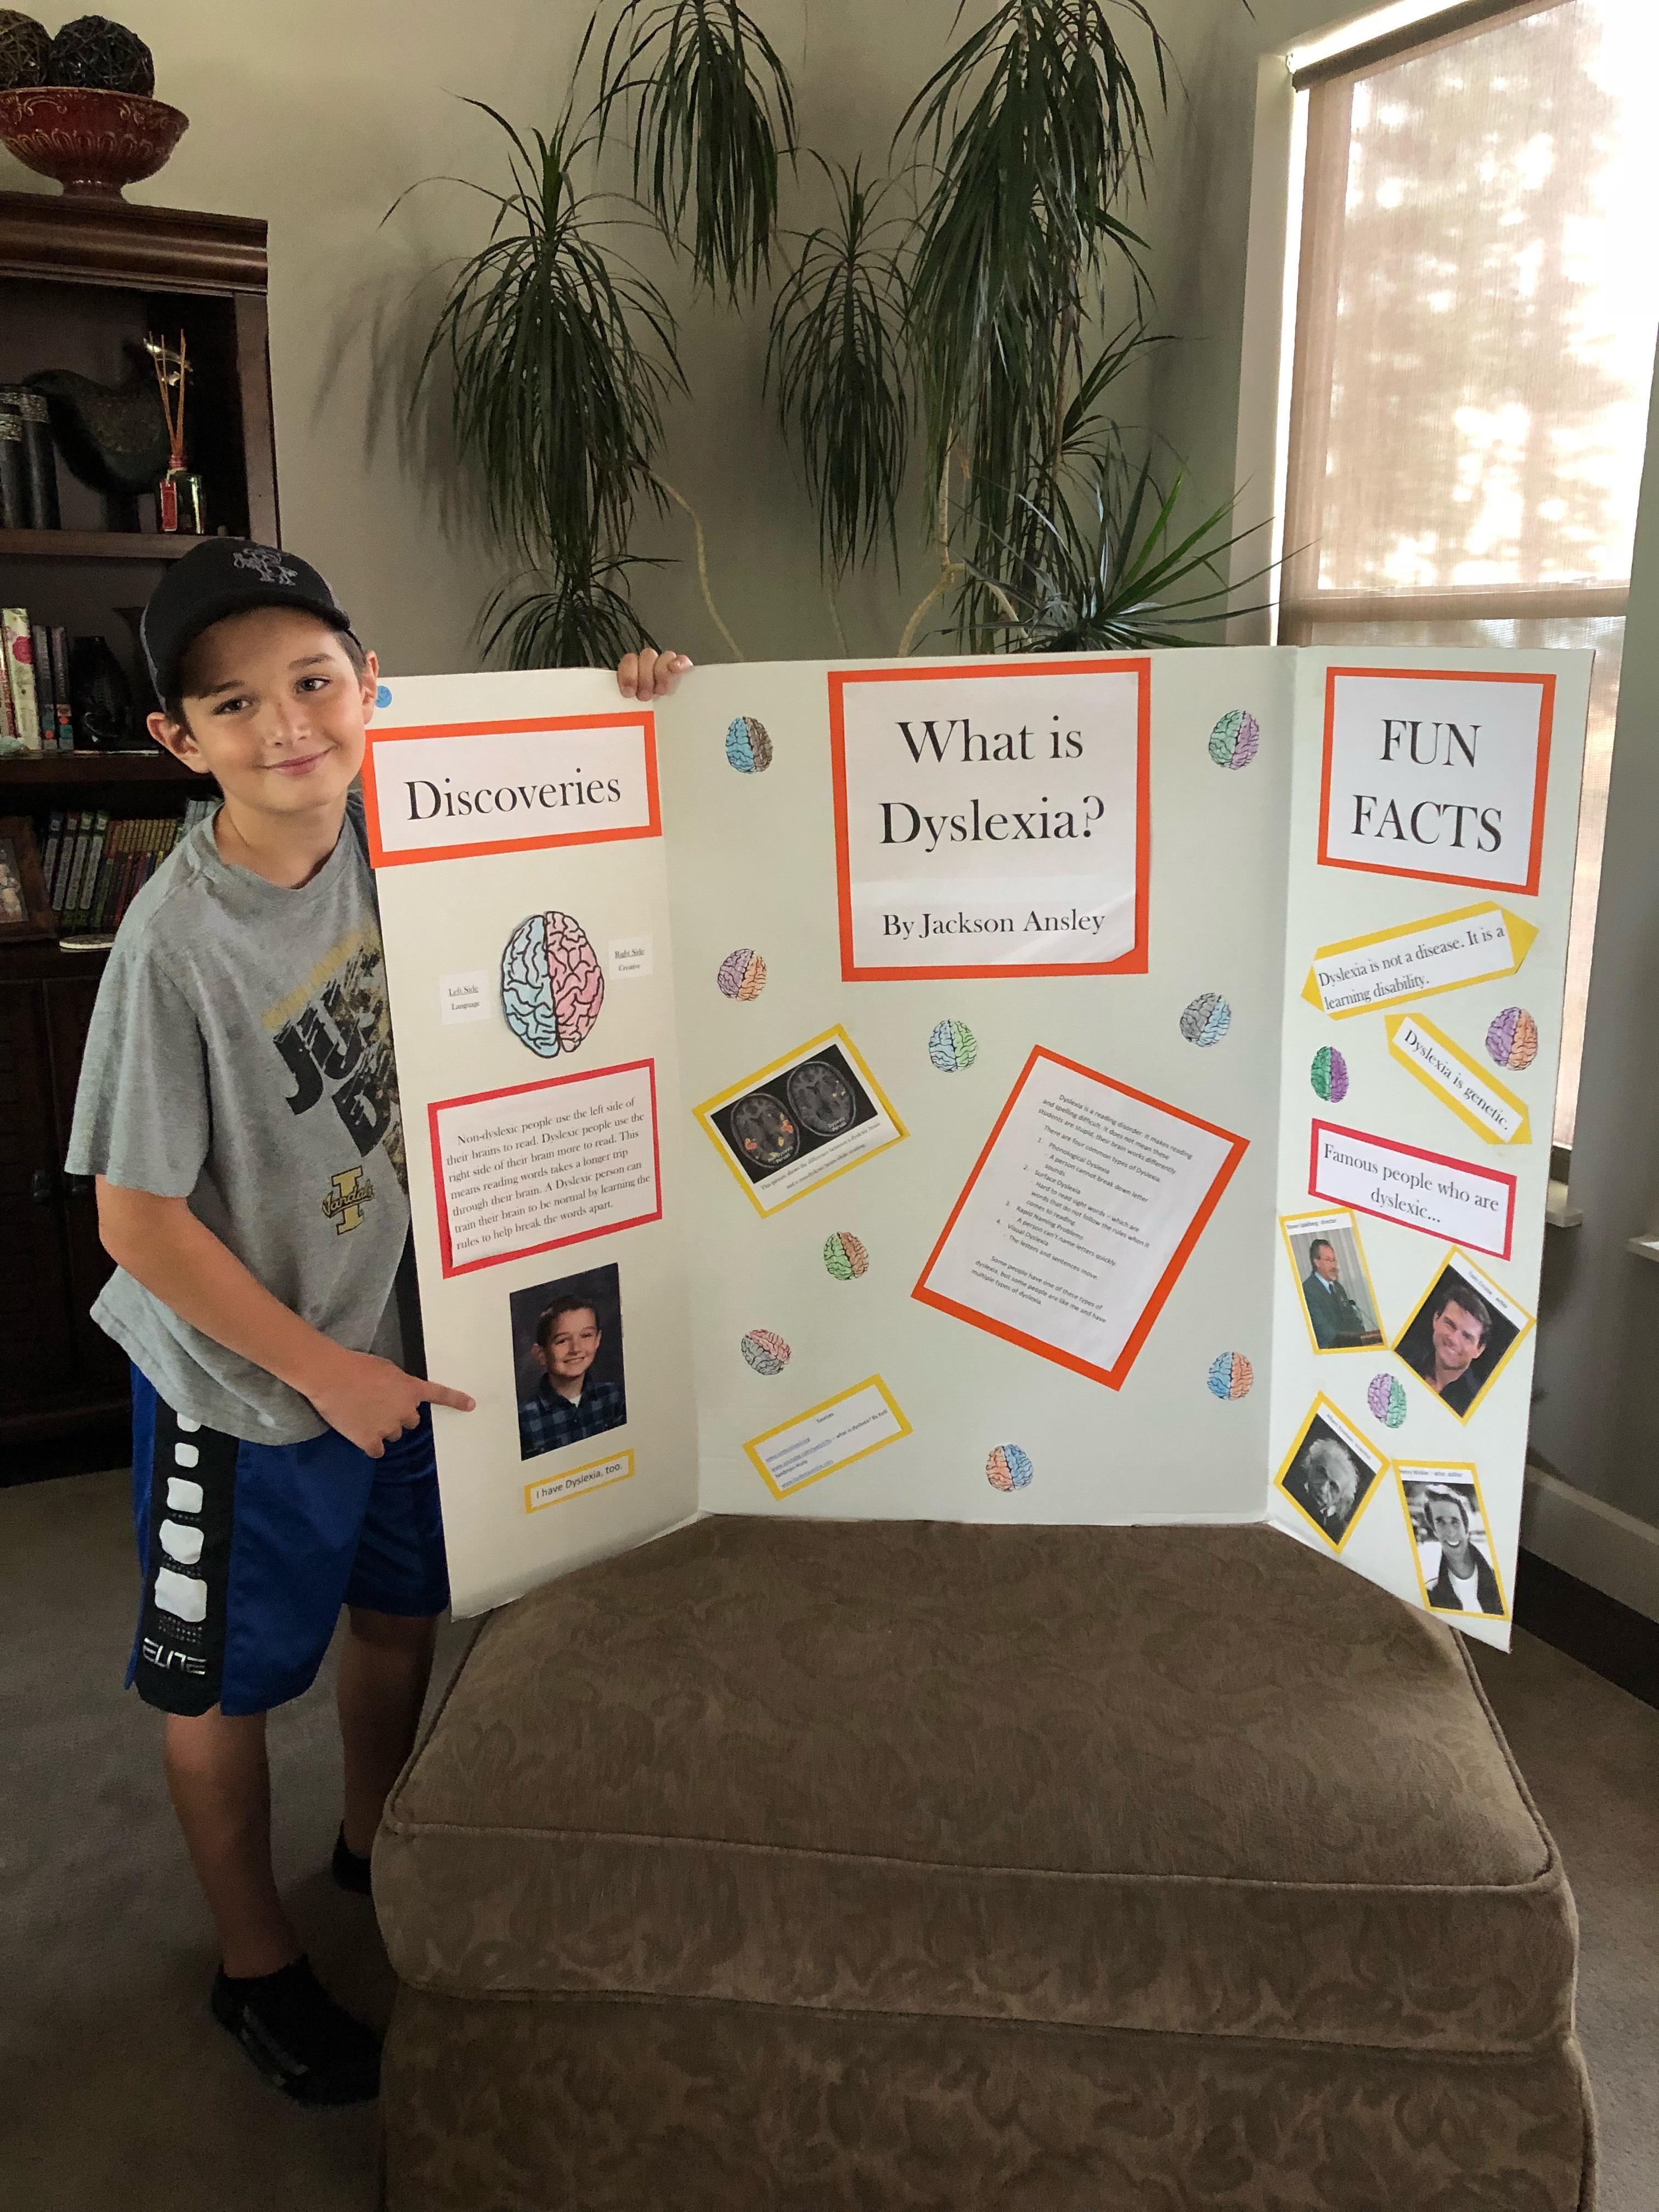 Jackson's presentation